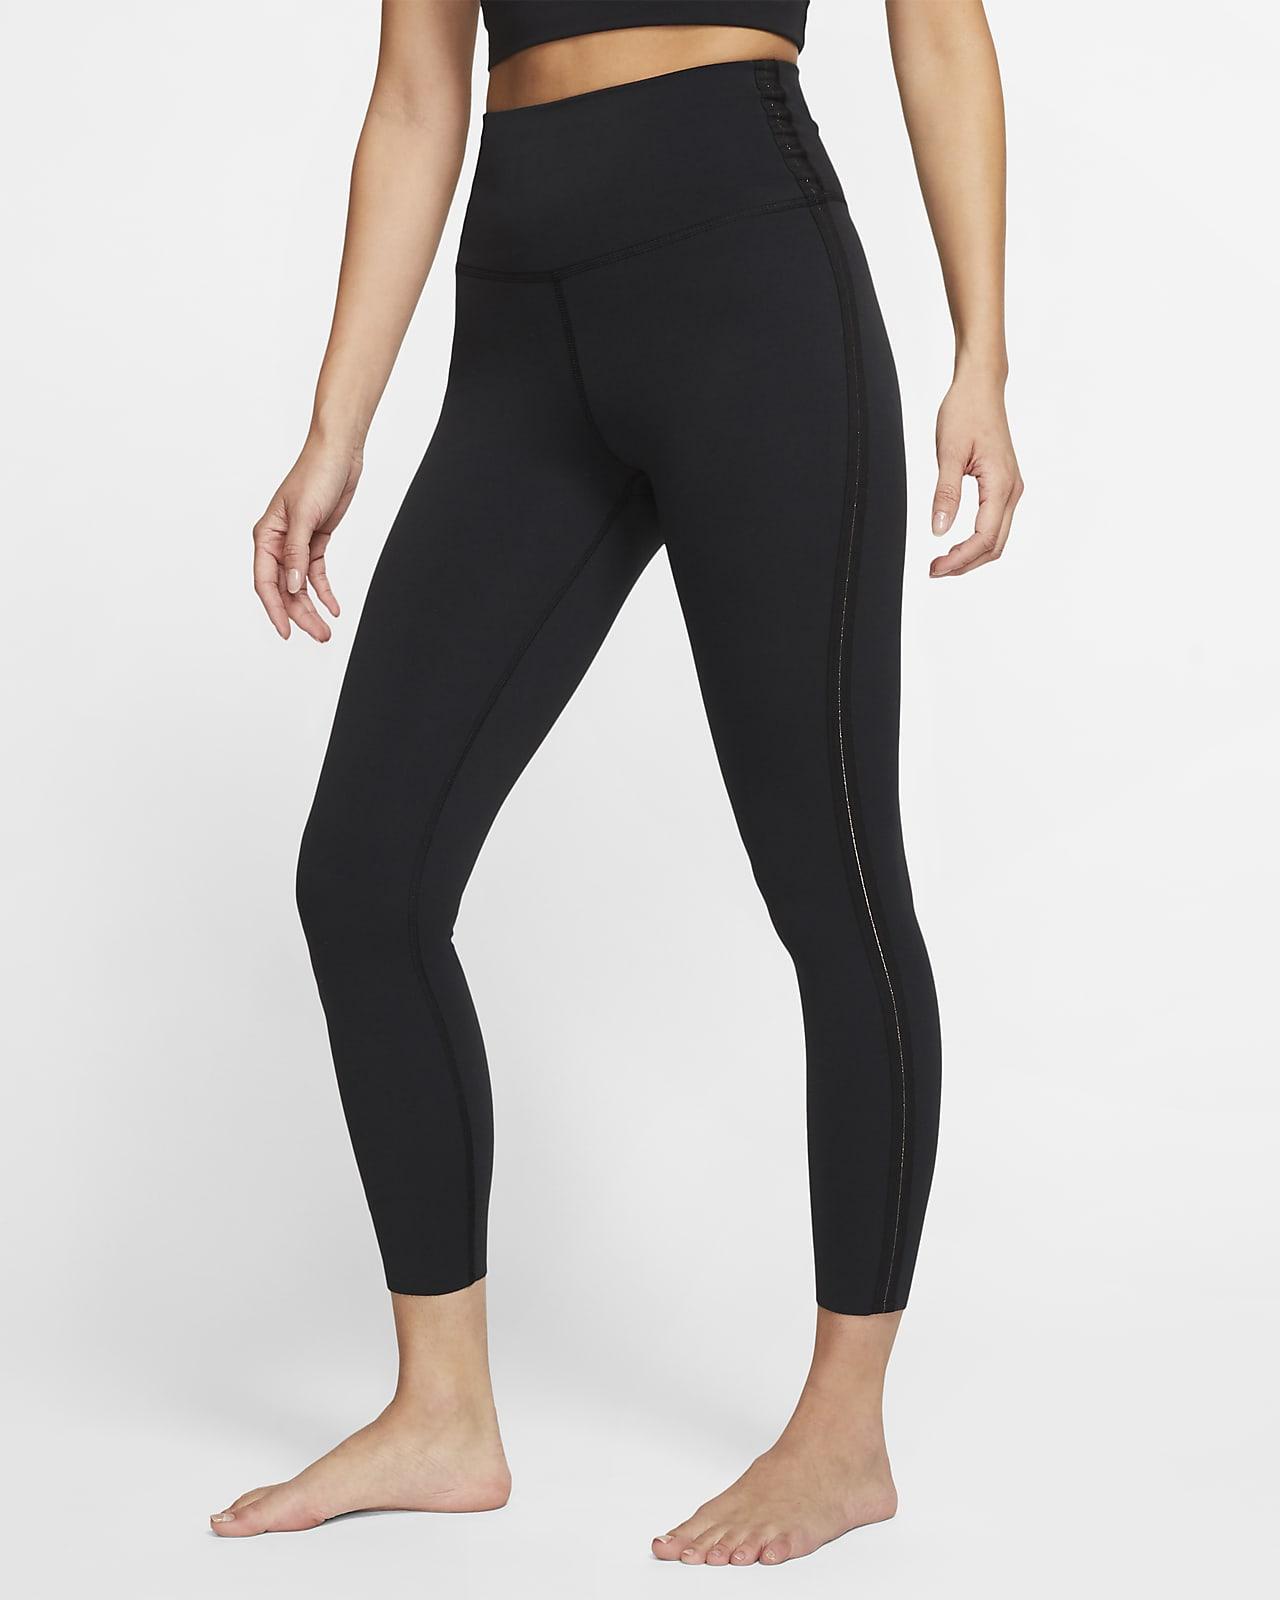 Tights a 7/8 em Infinalon Nike Yoga Luxe para mulher